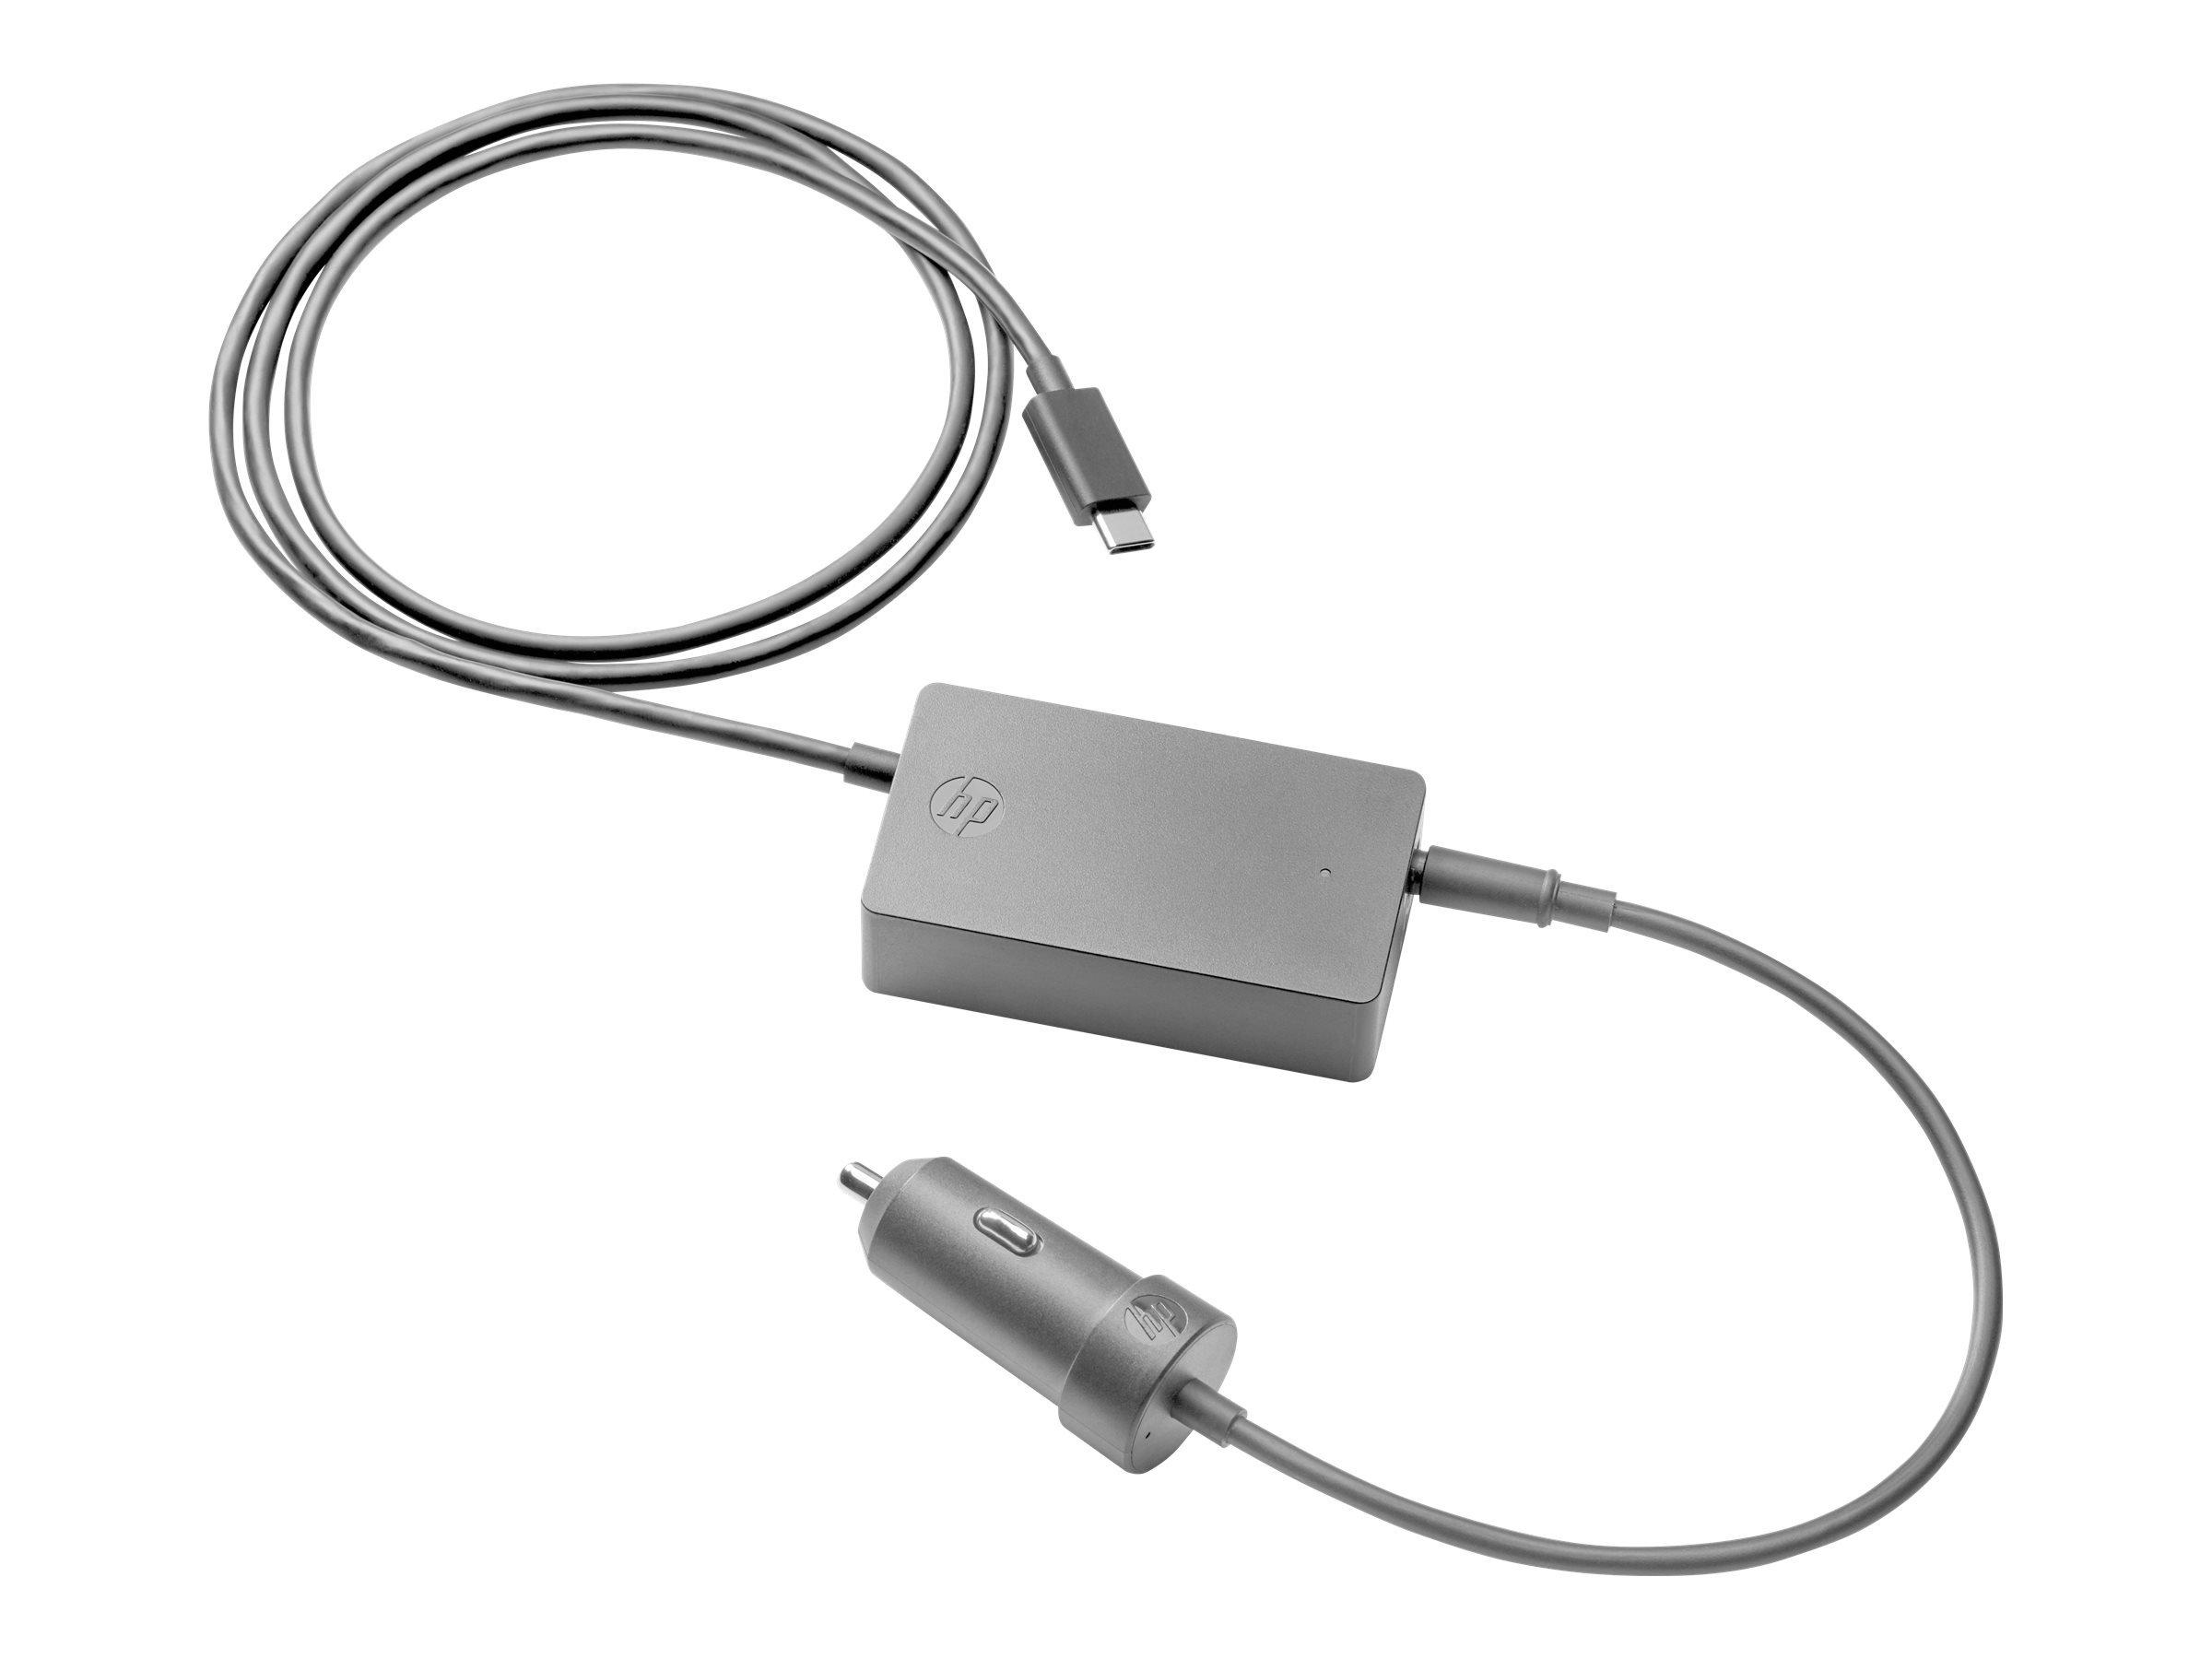 HP USB-C Auto Adapter - Car Power Adapter - 45 Watt - Black